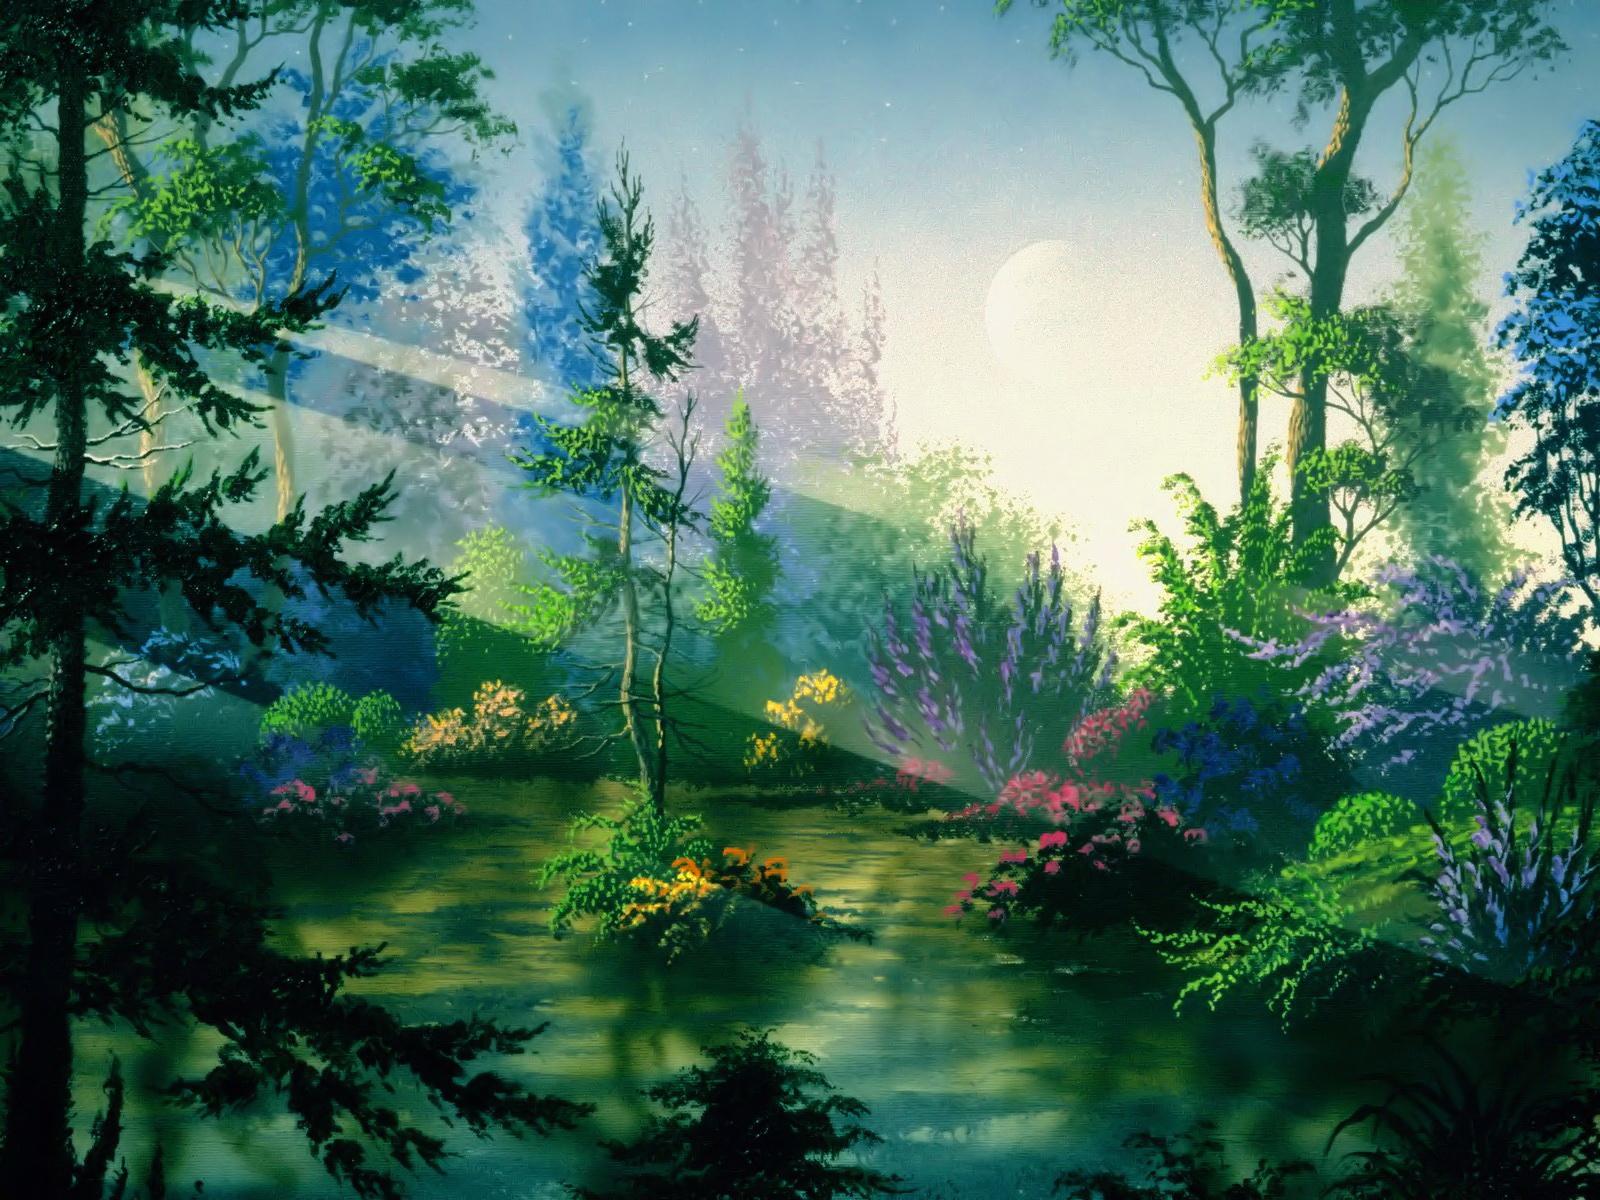 http://4.bp.blogspot.com/-viLA7VmXMcU/TpCIla2gRLI/AAAAAAAAArQ/2qL4YRi6I-M/s1600/fantasy-forest-wallpapers_10621_1600x1200.jpg